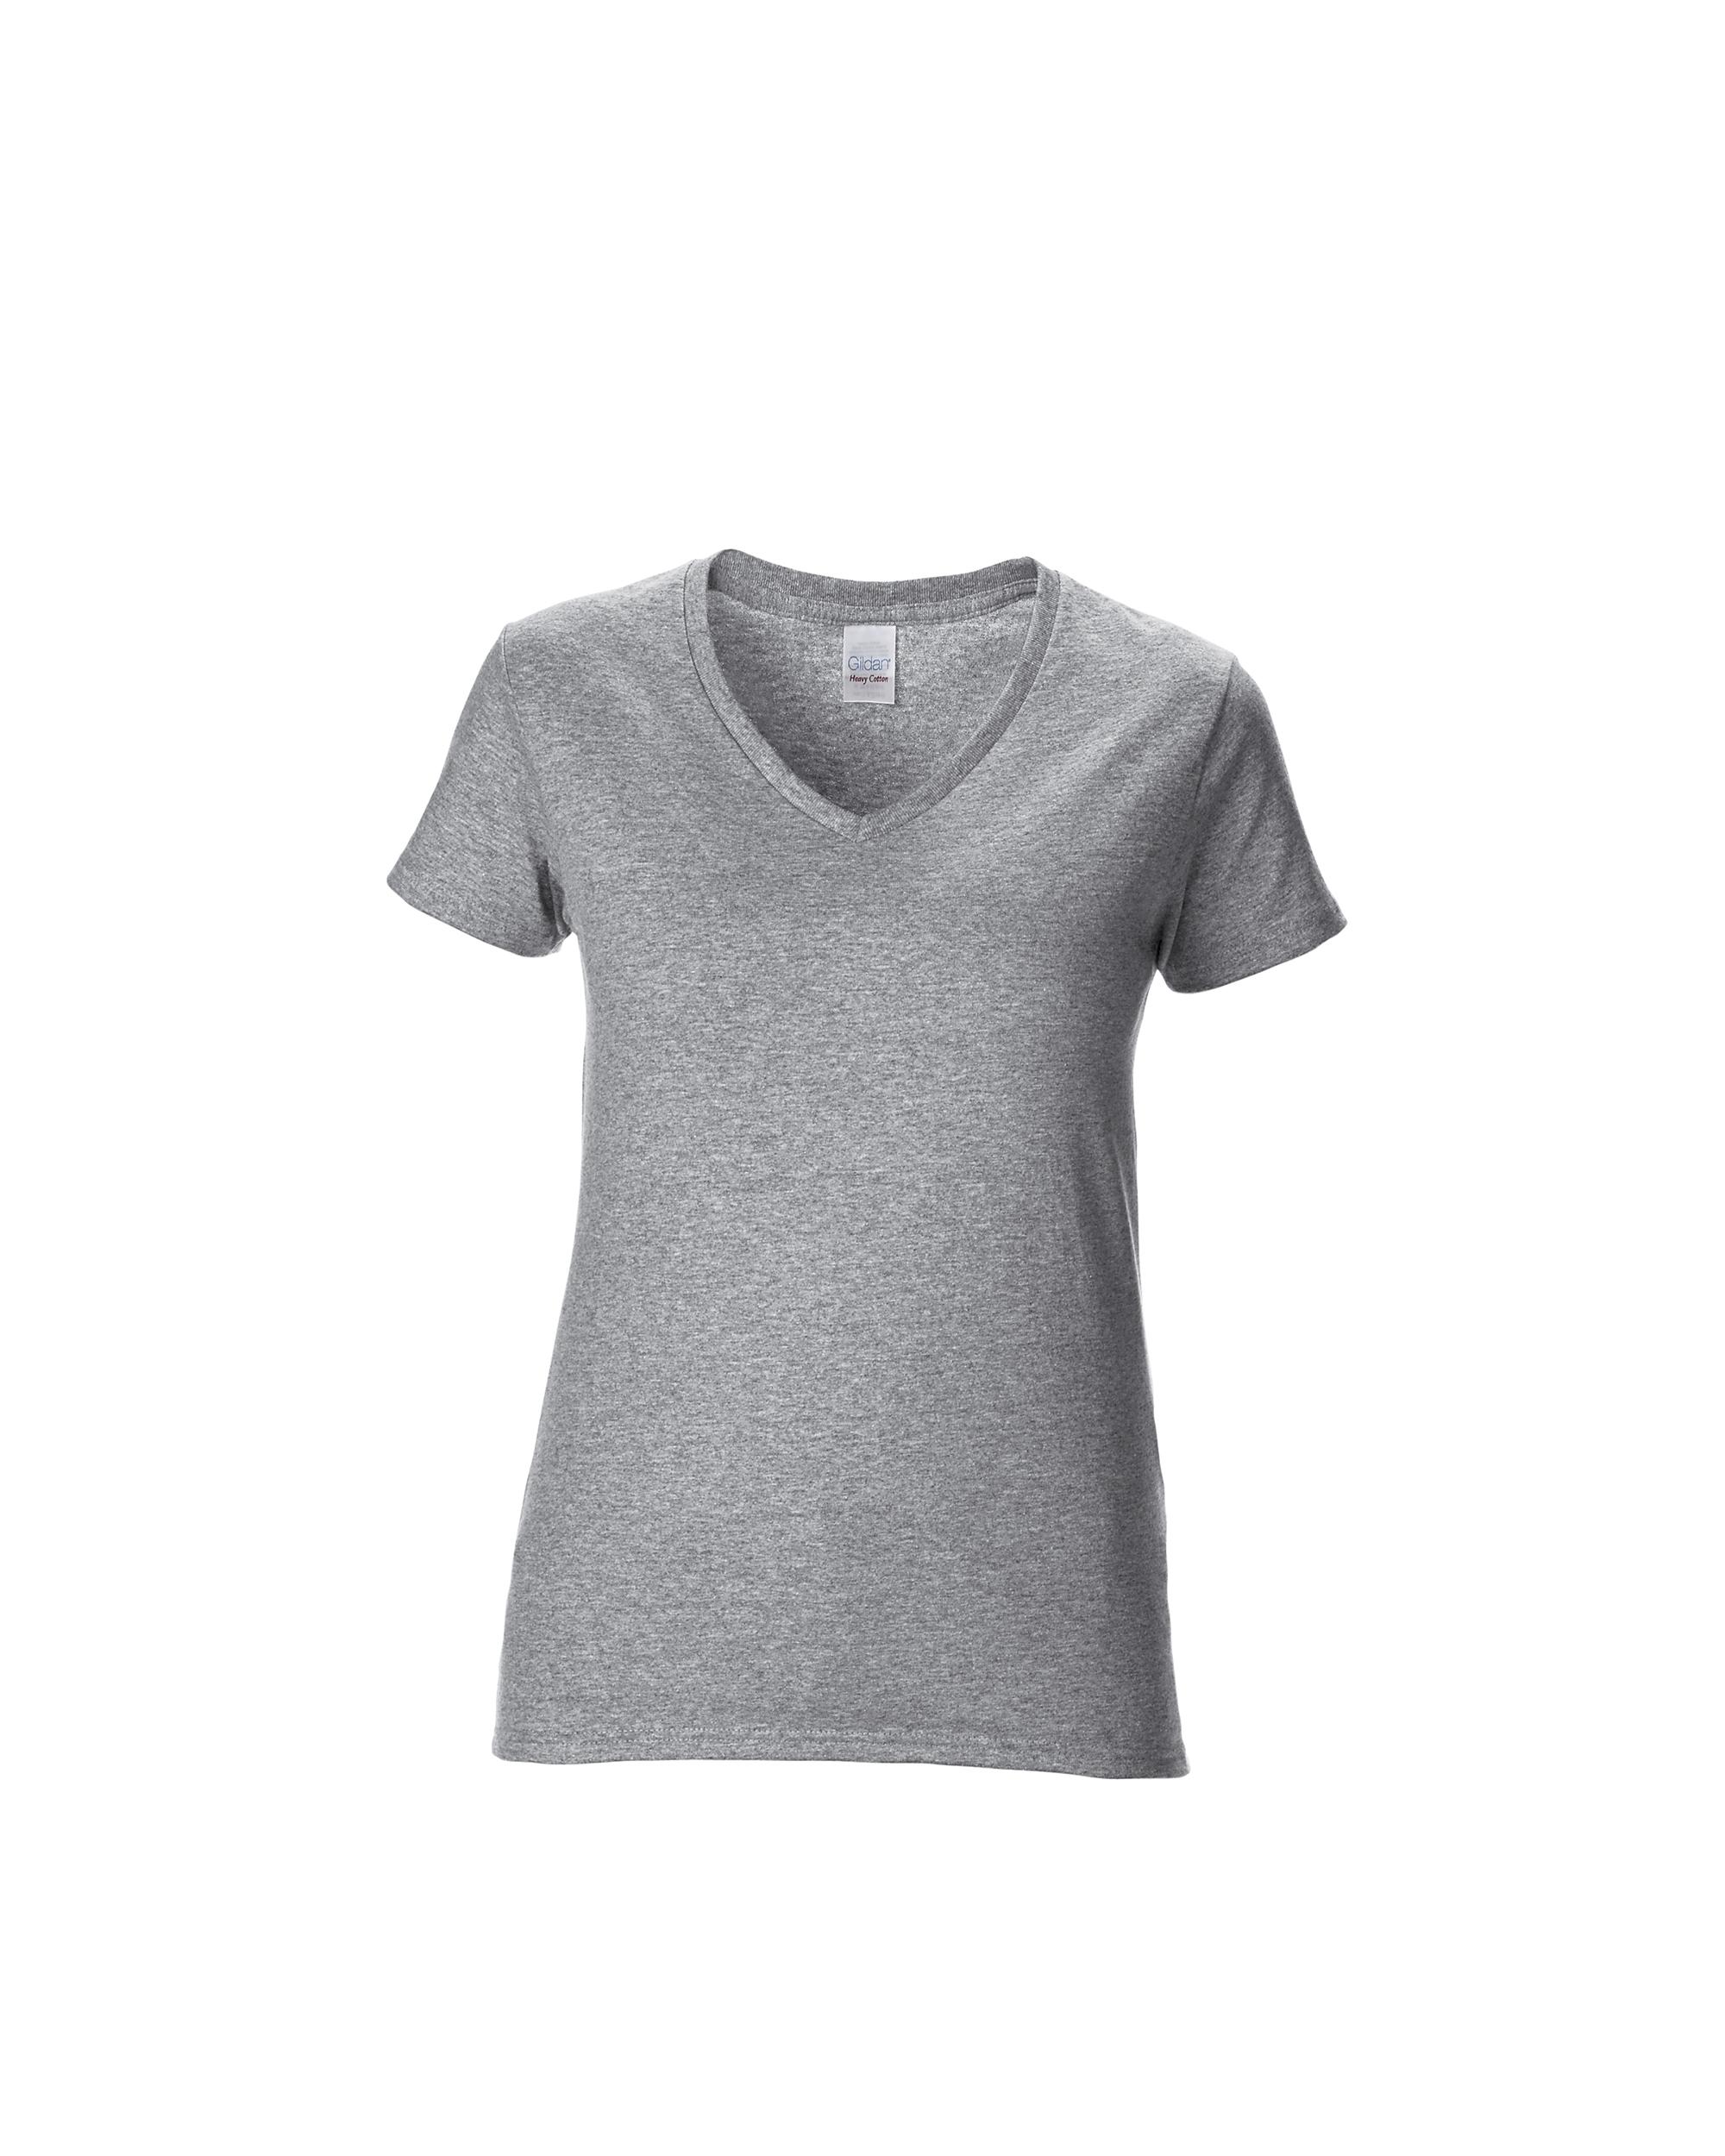 bf9c50c2acc8e Women s Soft Style Junior Fit V-Neck T-Shirt - Team Shirt Pros